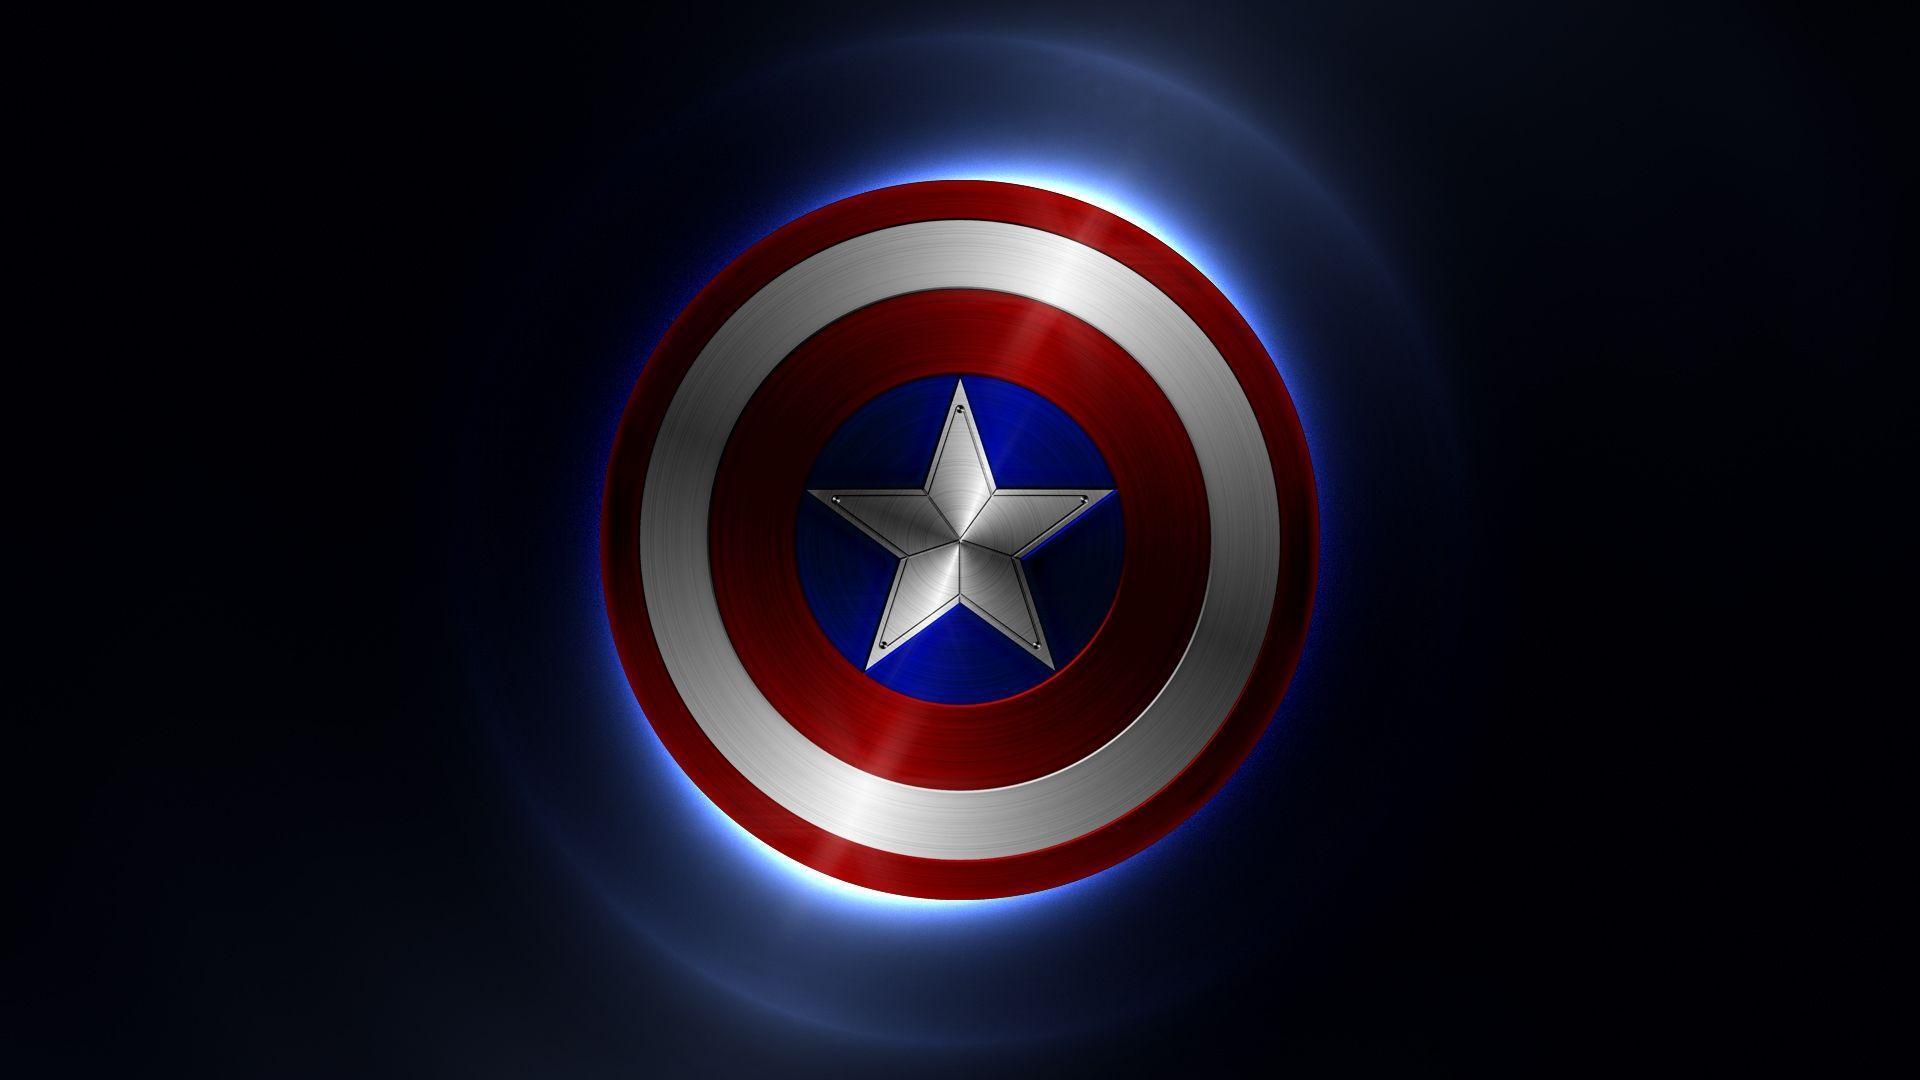 Captain America Hd Wallpapers Wallpaper Cave